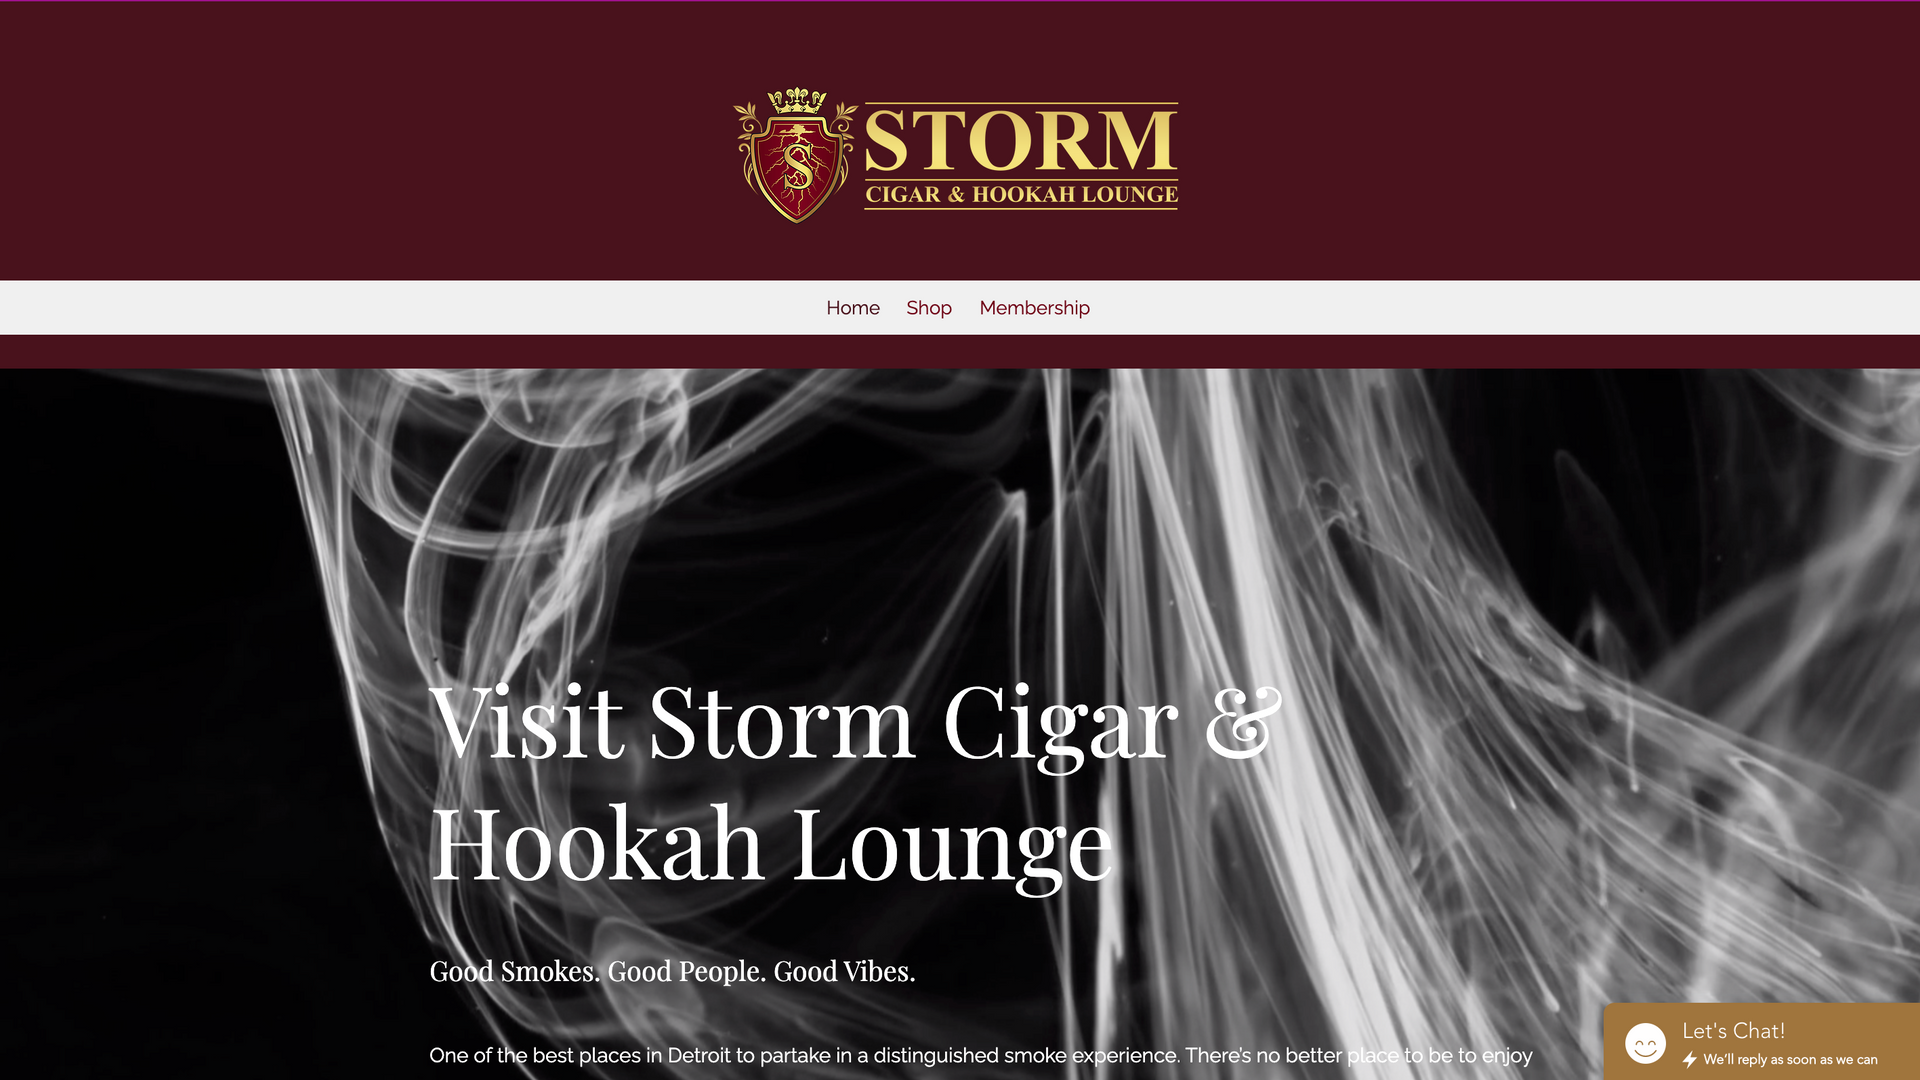 Storm Cigar & Hookah Lounge